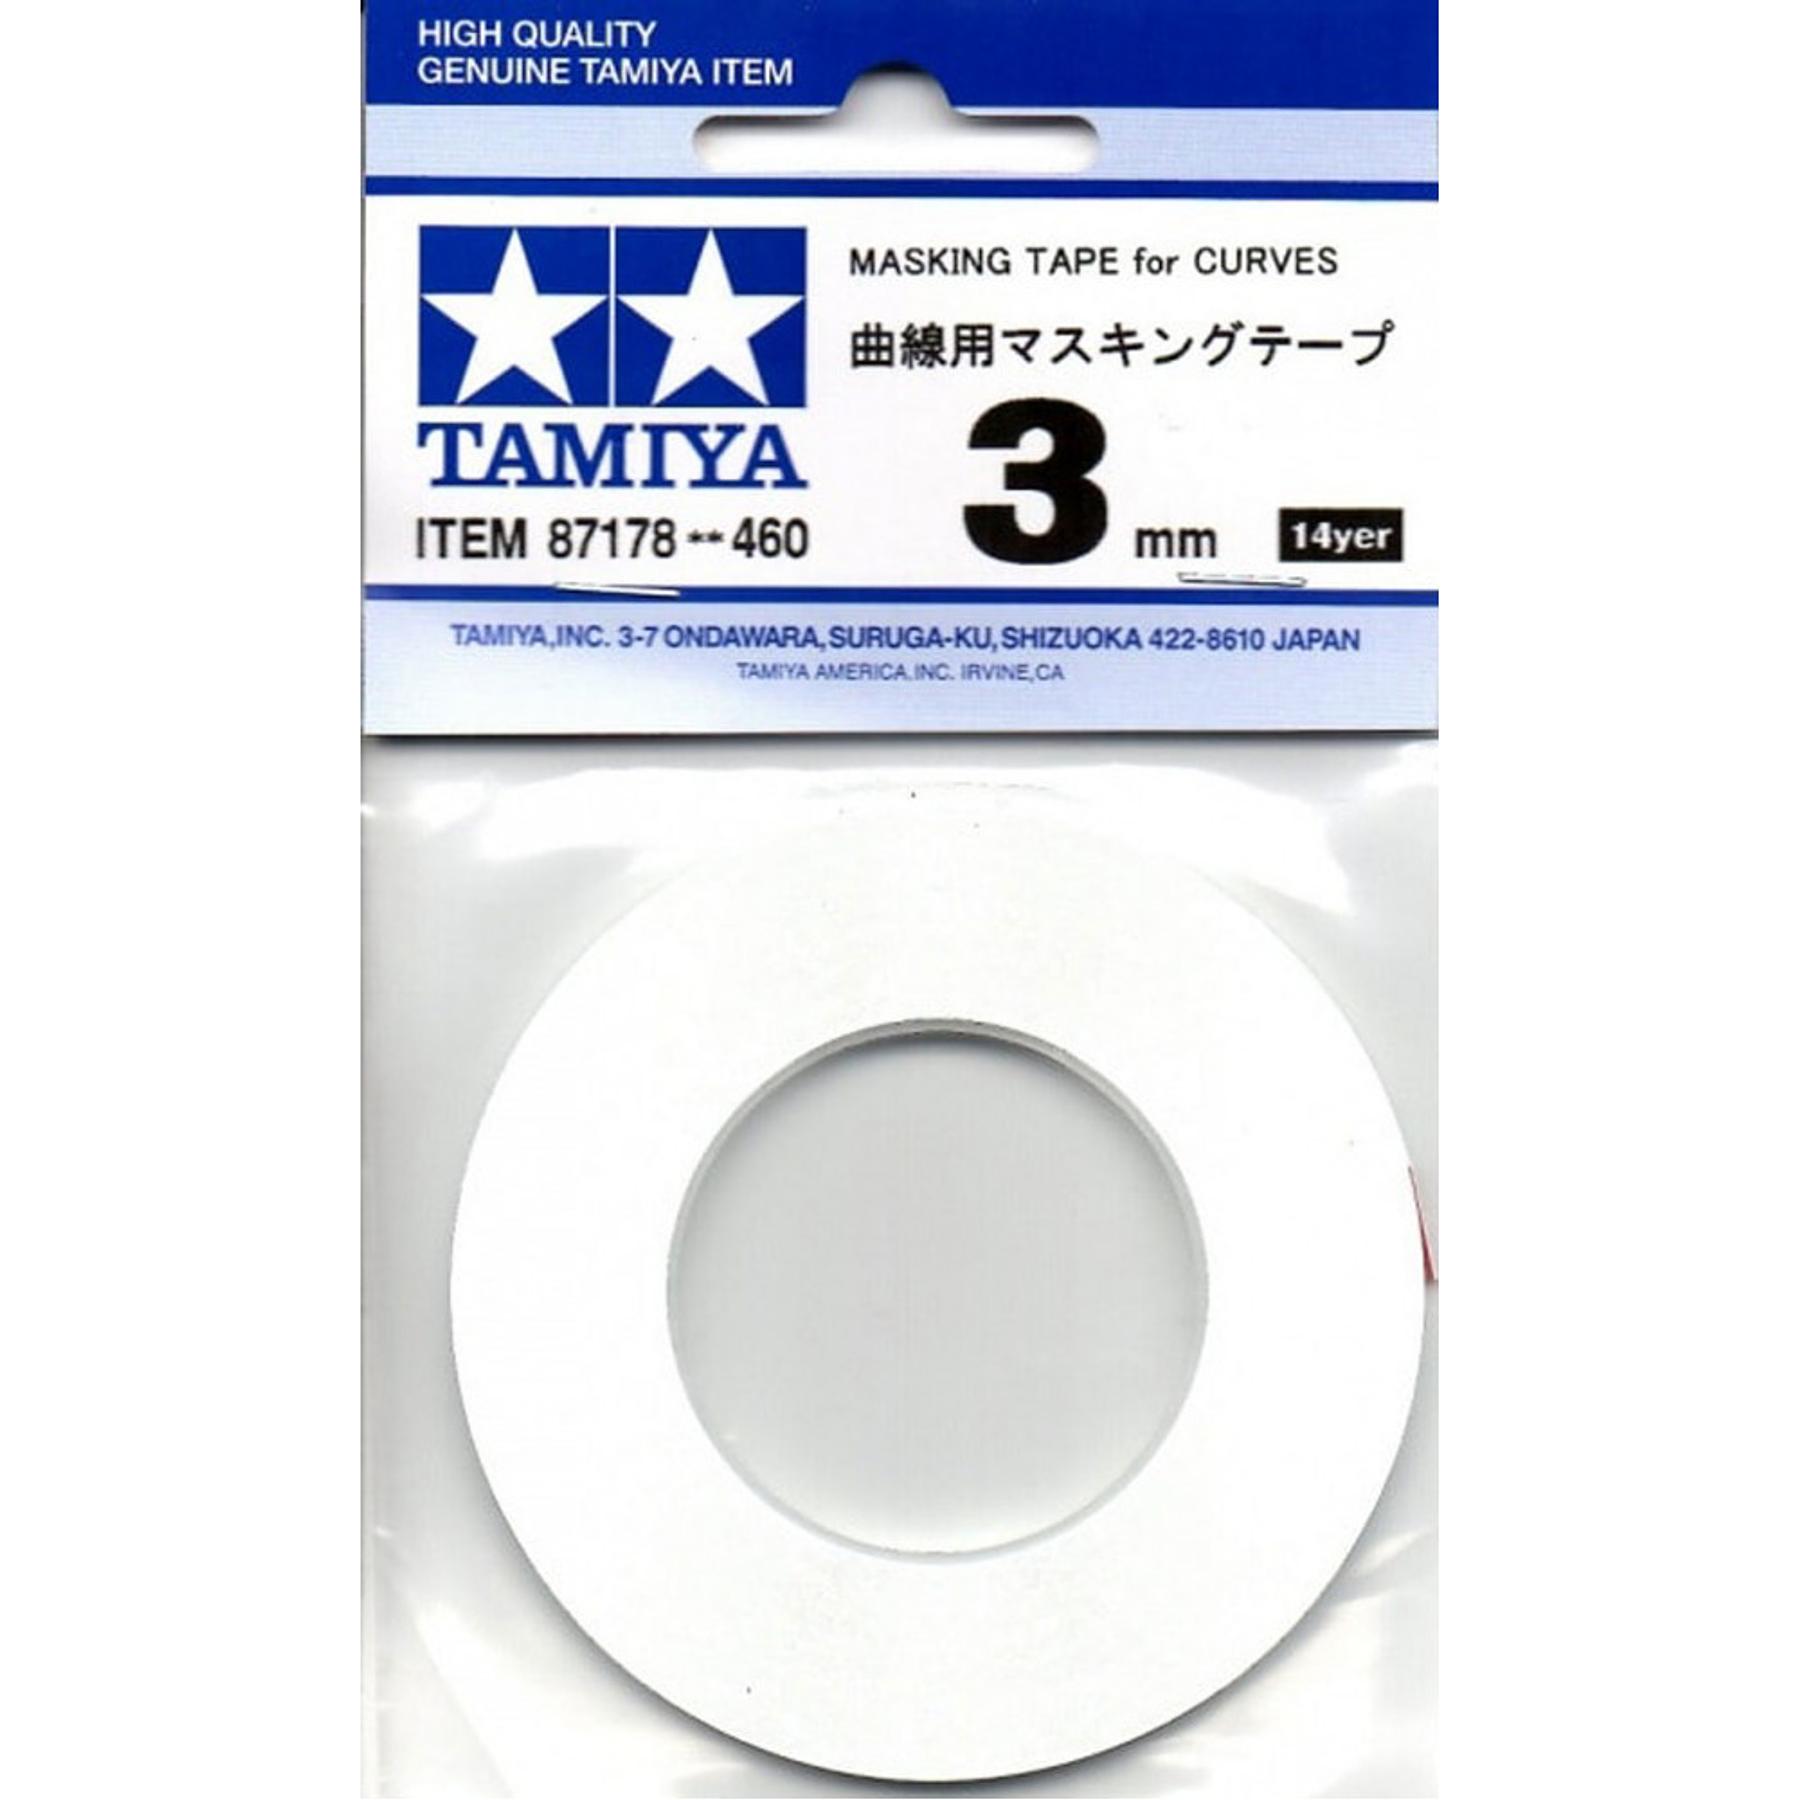 Tamiya Masking Tape for Curve 3mm